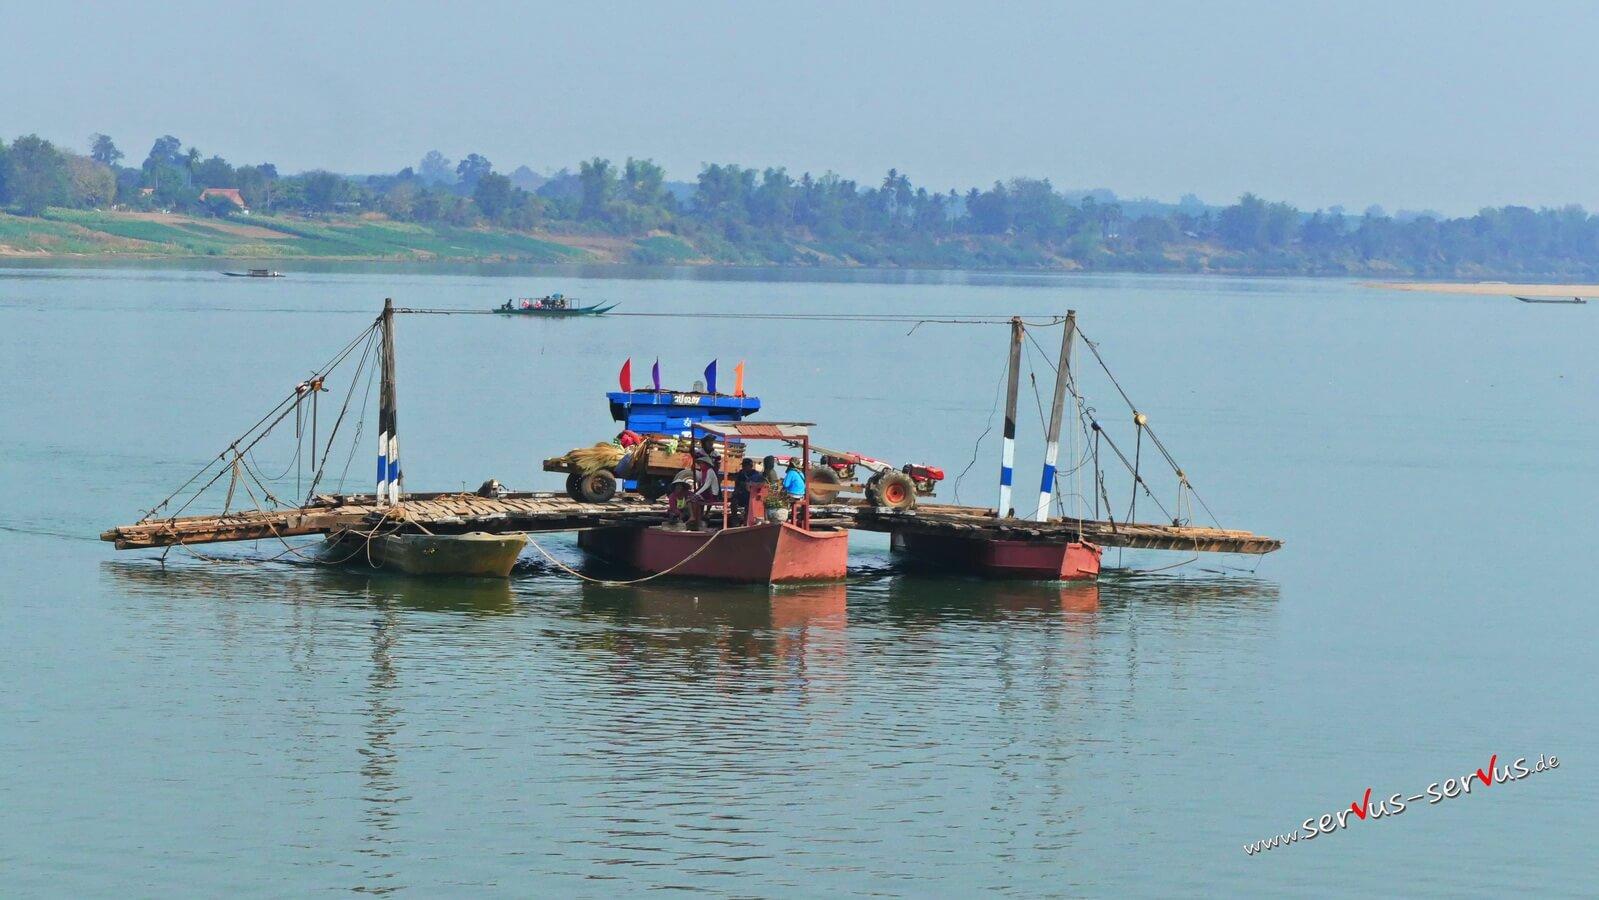 einfacher Fähre auf dem Mekong bei Champasak